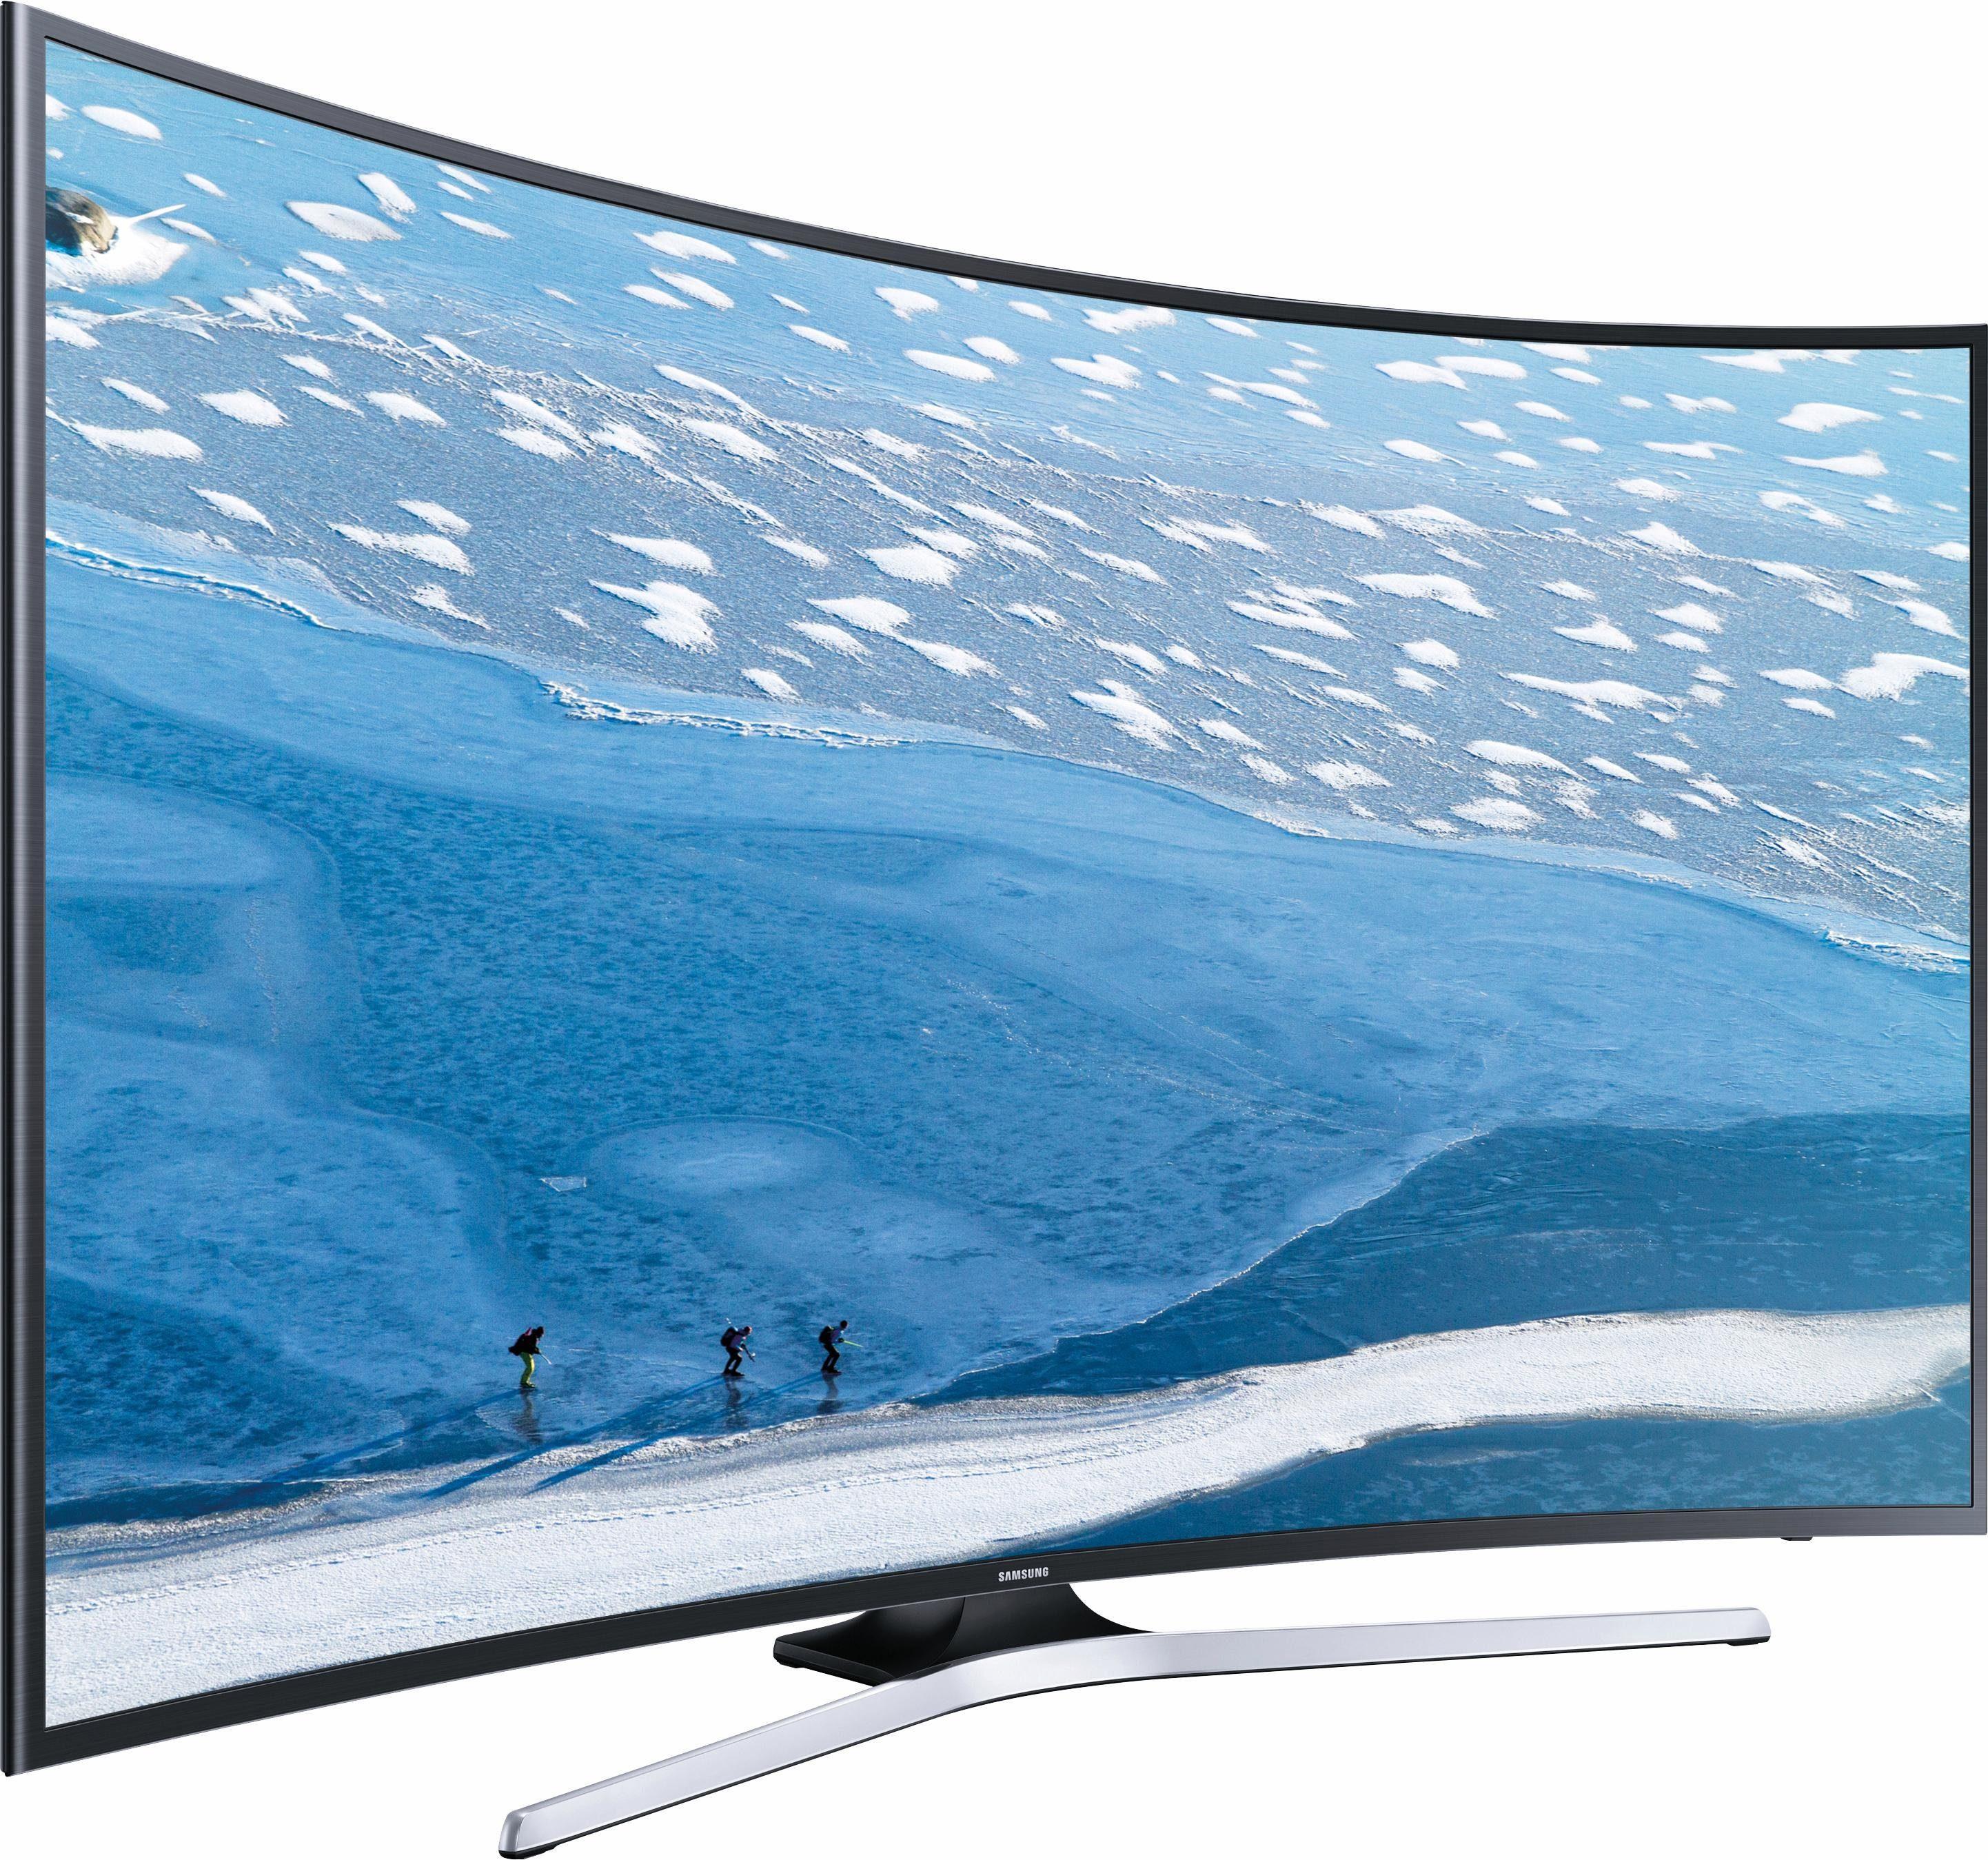 Samsung UE55KU6179UXZG, Curved-LED-Fernseher, 138 cm (55 Zoll), 2160p (4K Ultra HD), Smart-TV